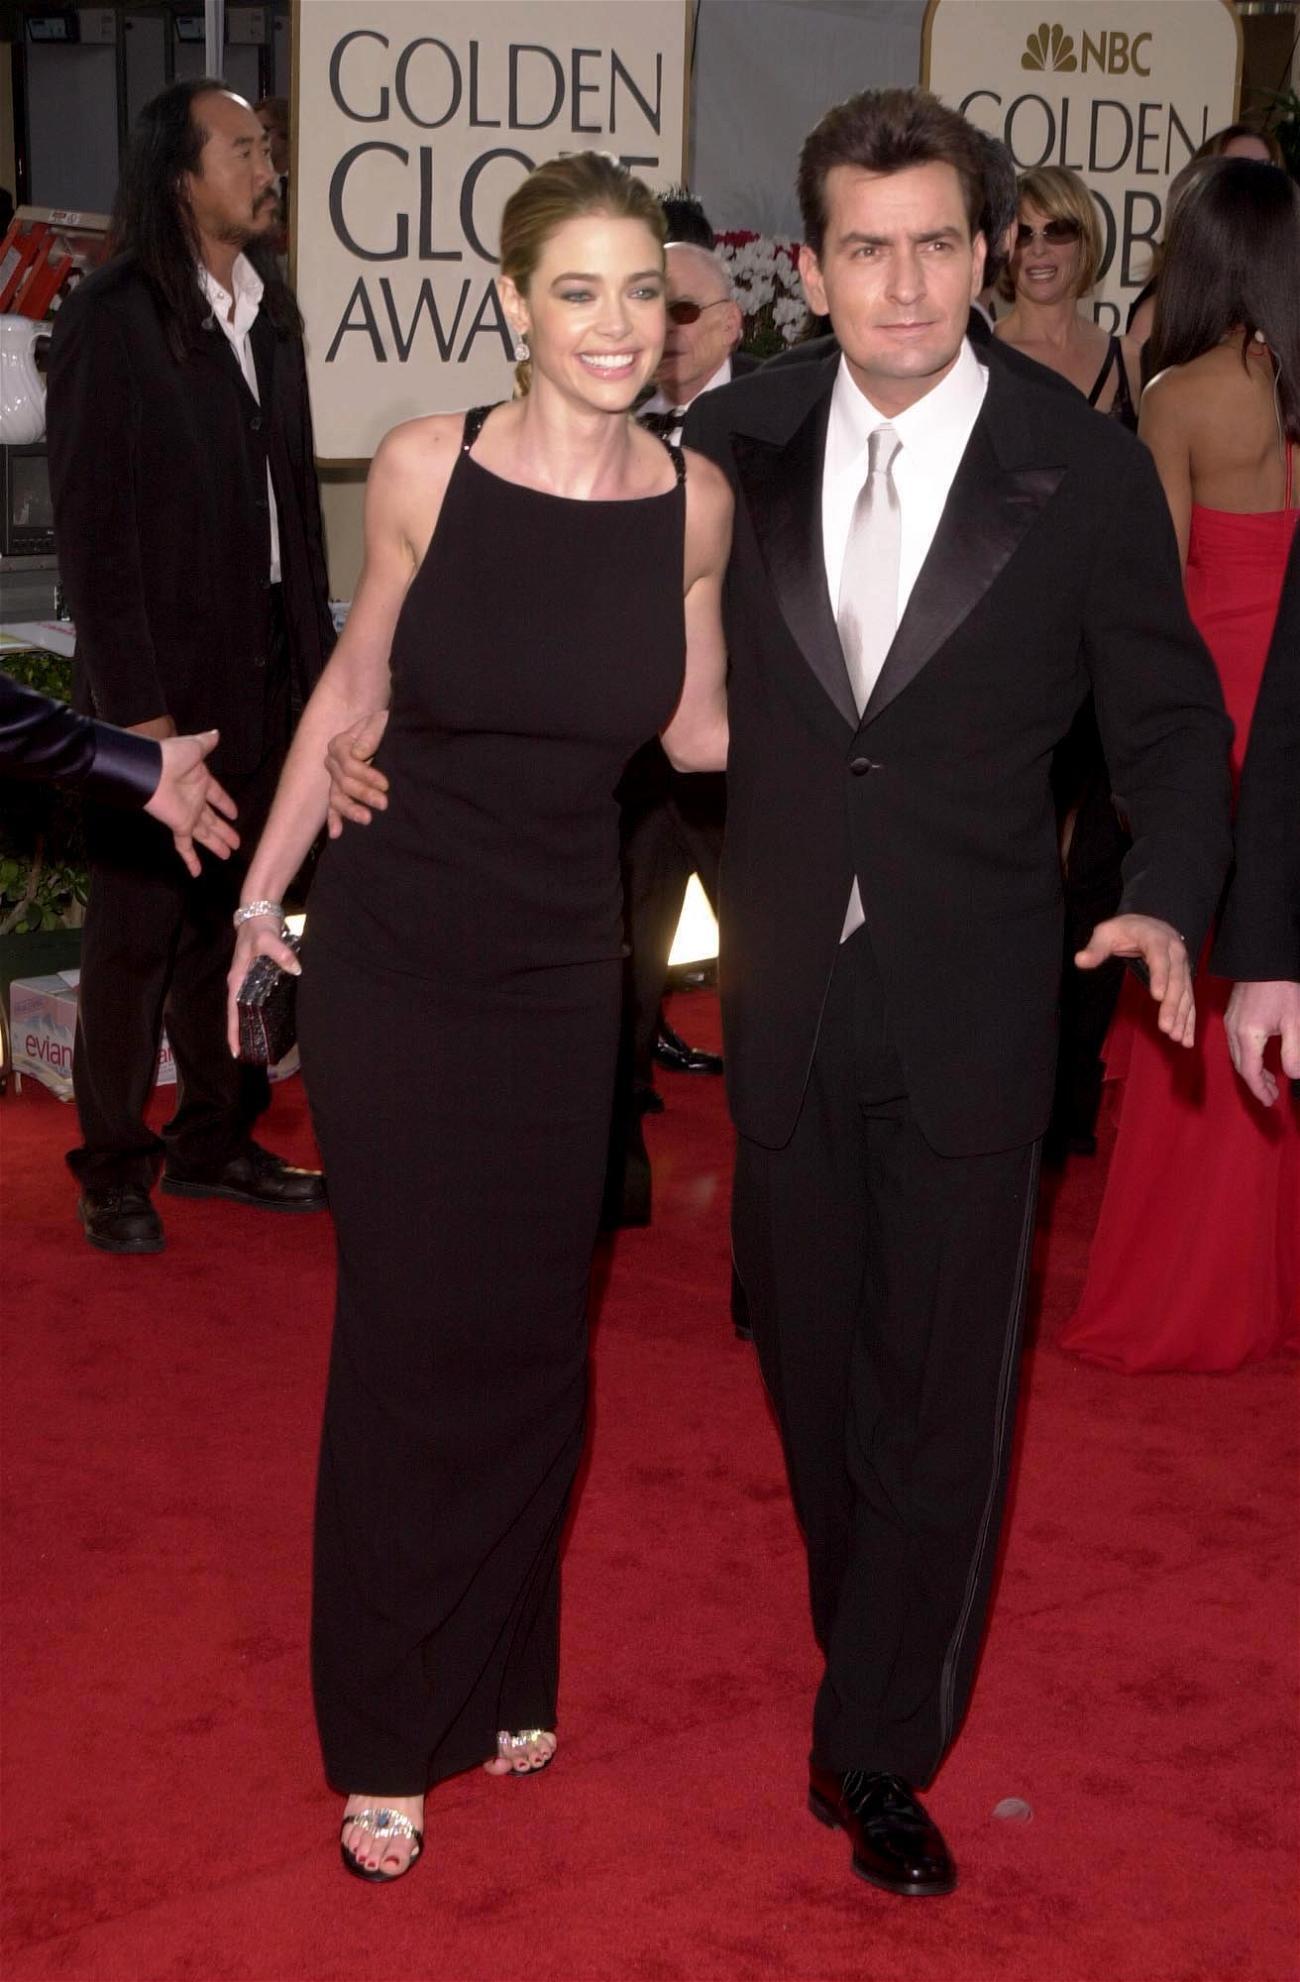 Denise Richards Breaks Her Silence On Charlie Sheen's Child Support Victory